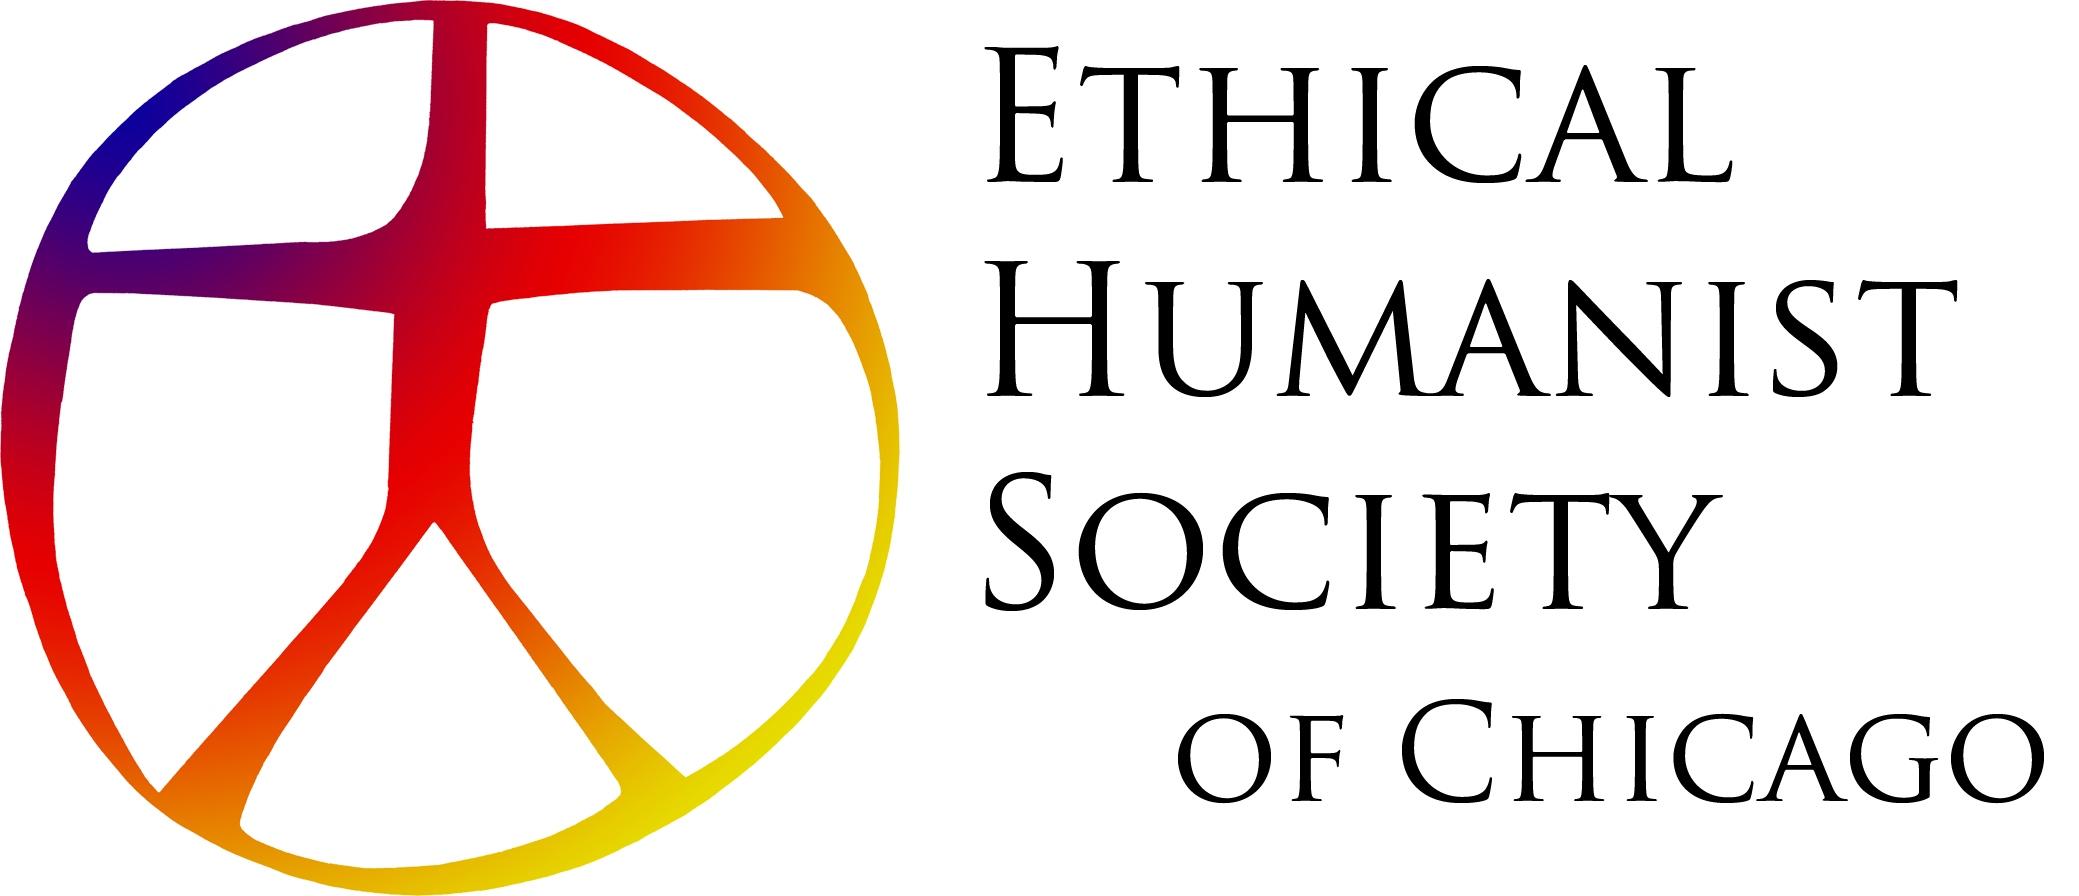 EthicalHumanistSociety.jpg